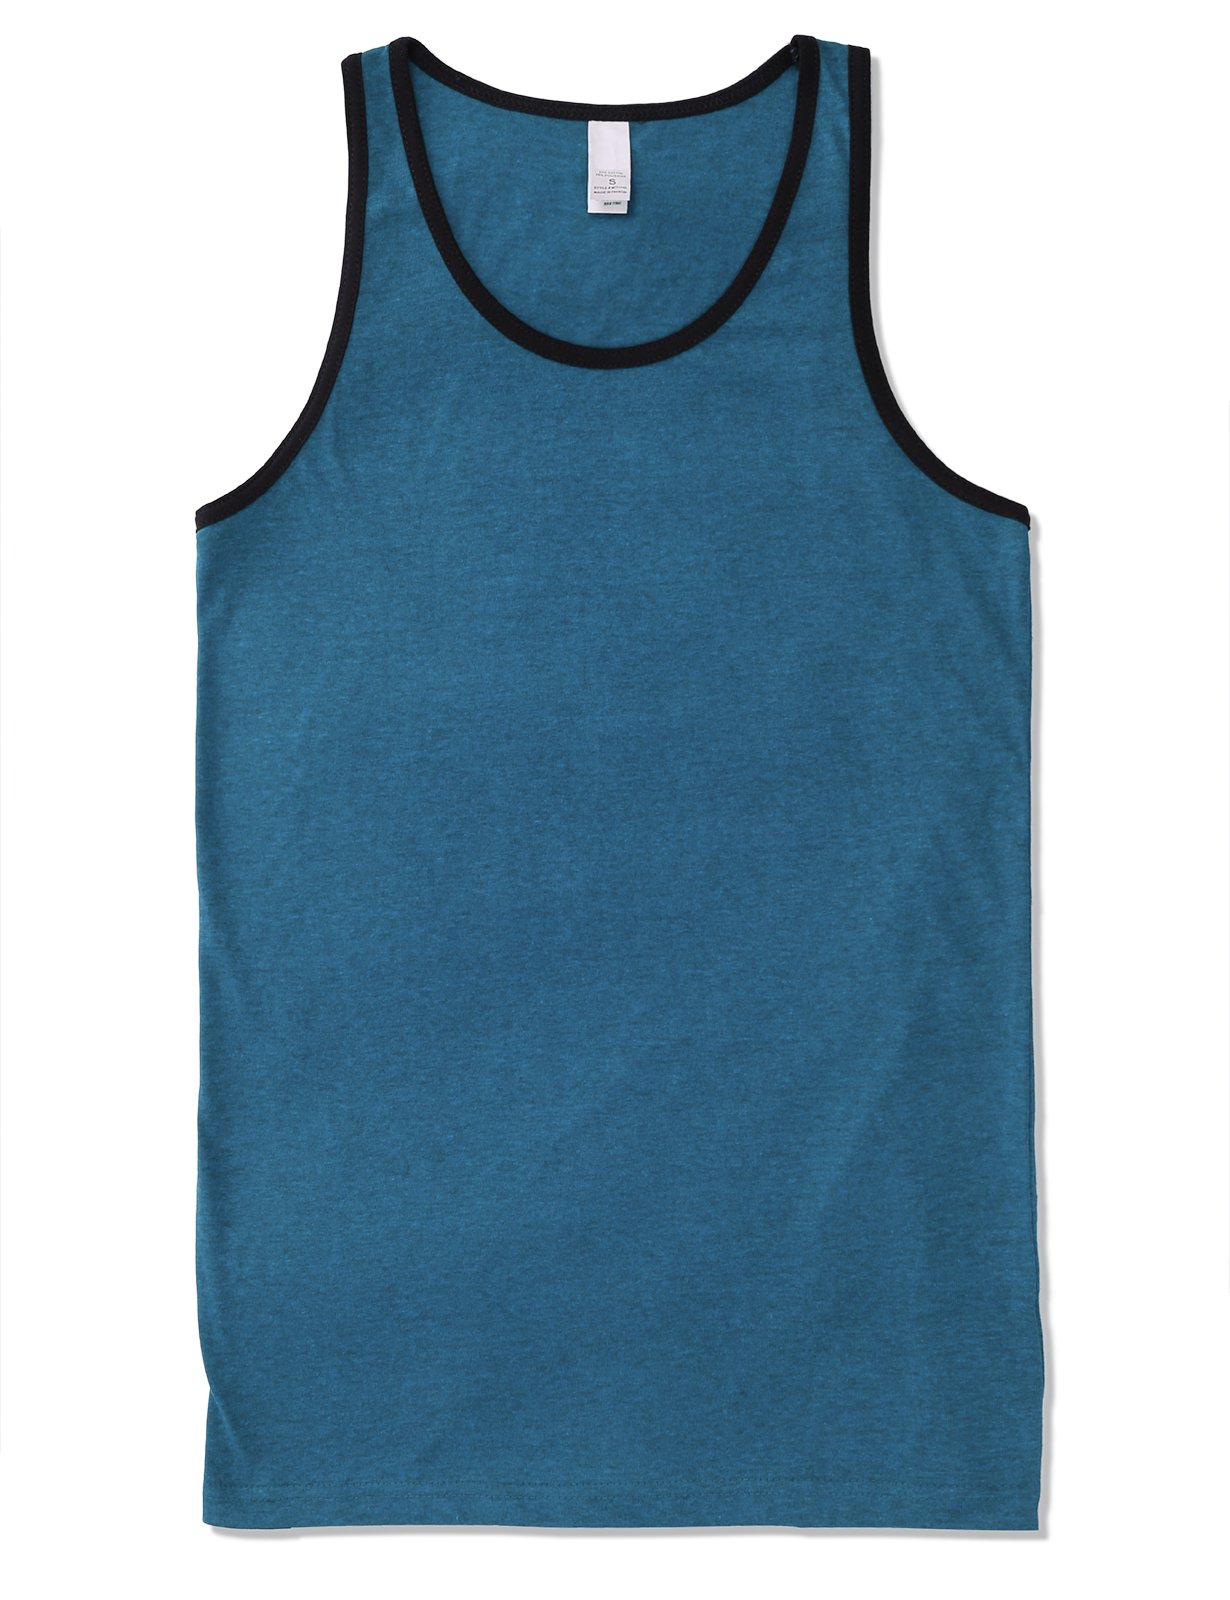 JD Apparel Mens Men's Basic Athletic Jersey Tank Top Contrast Binding M Turquoise Black